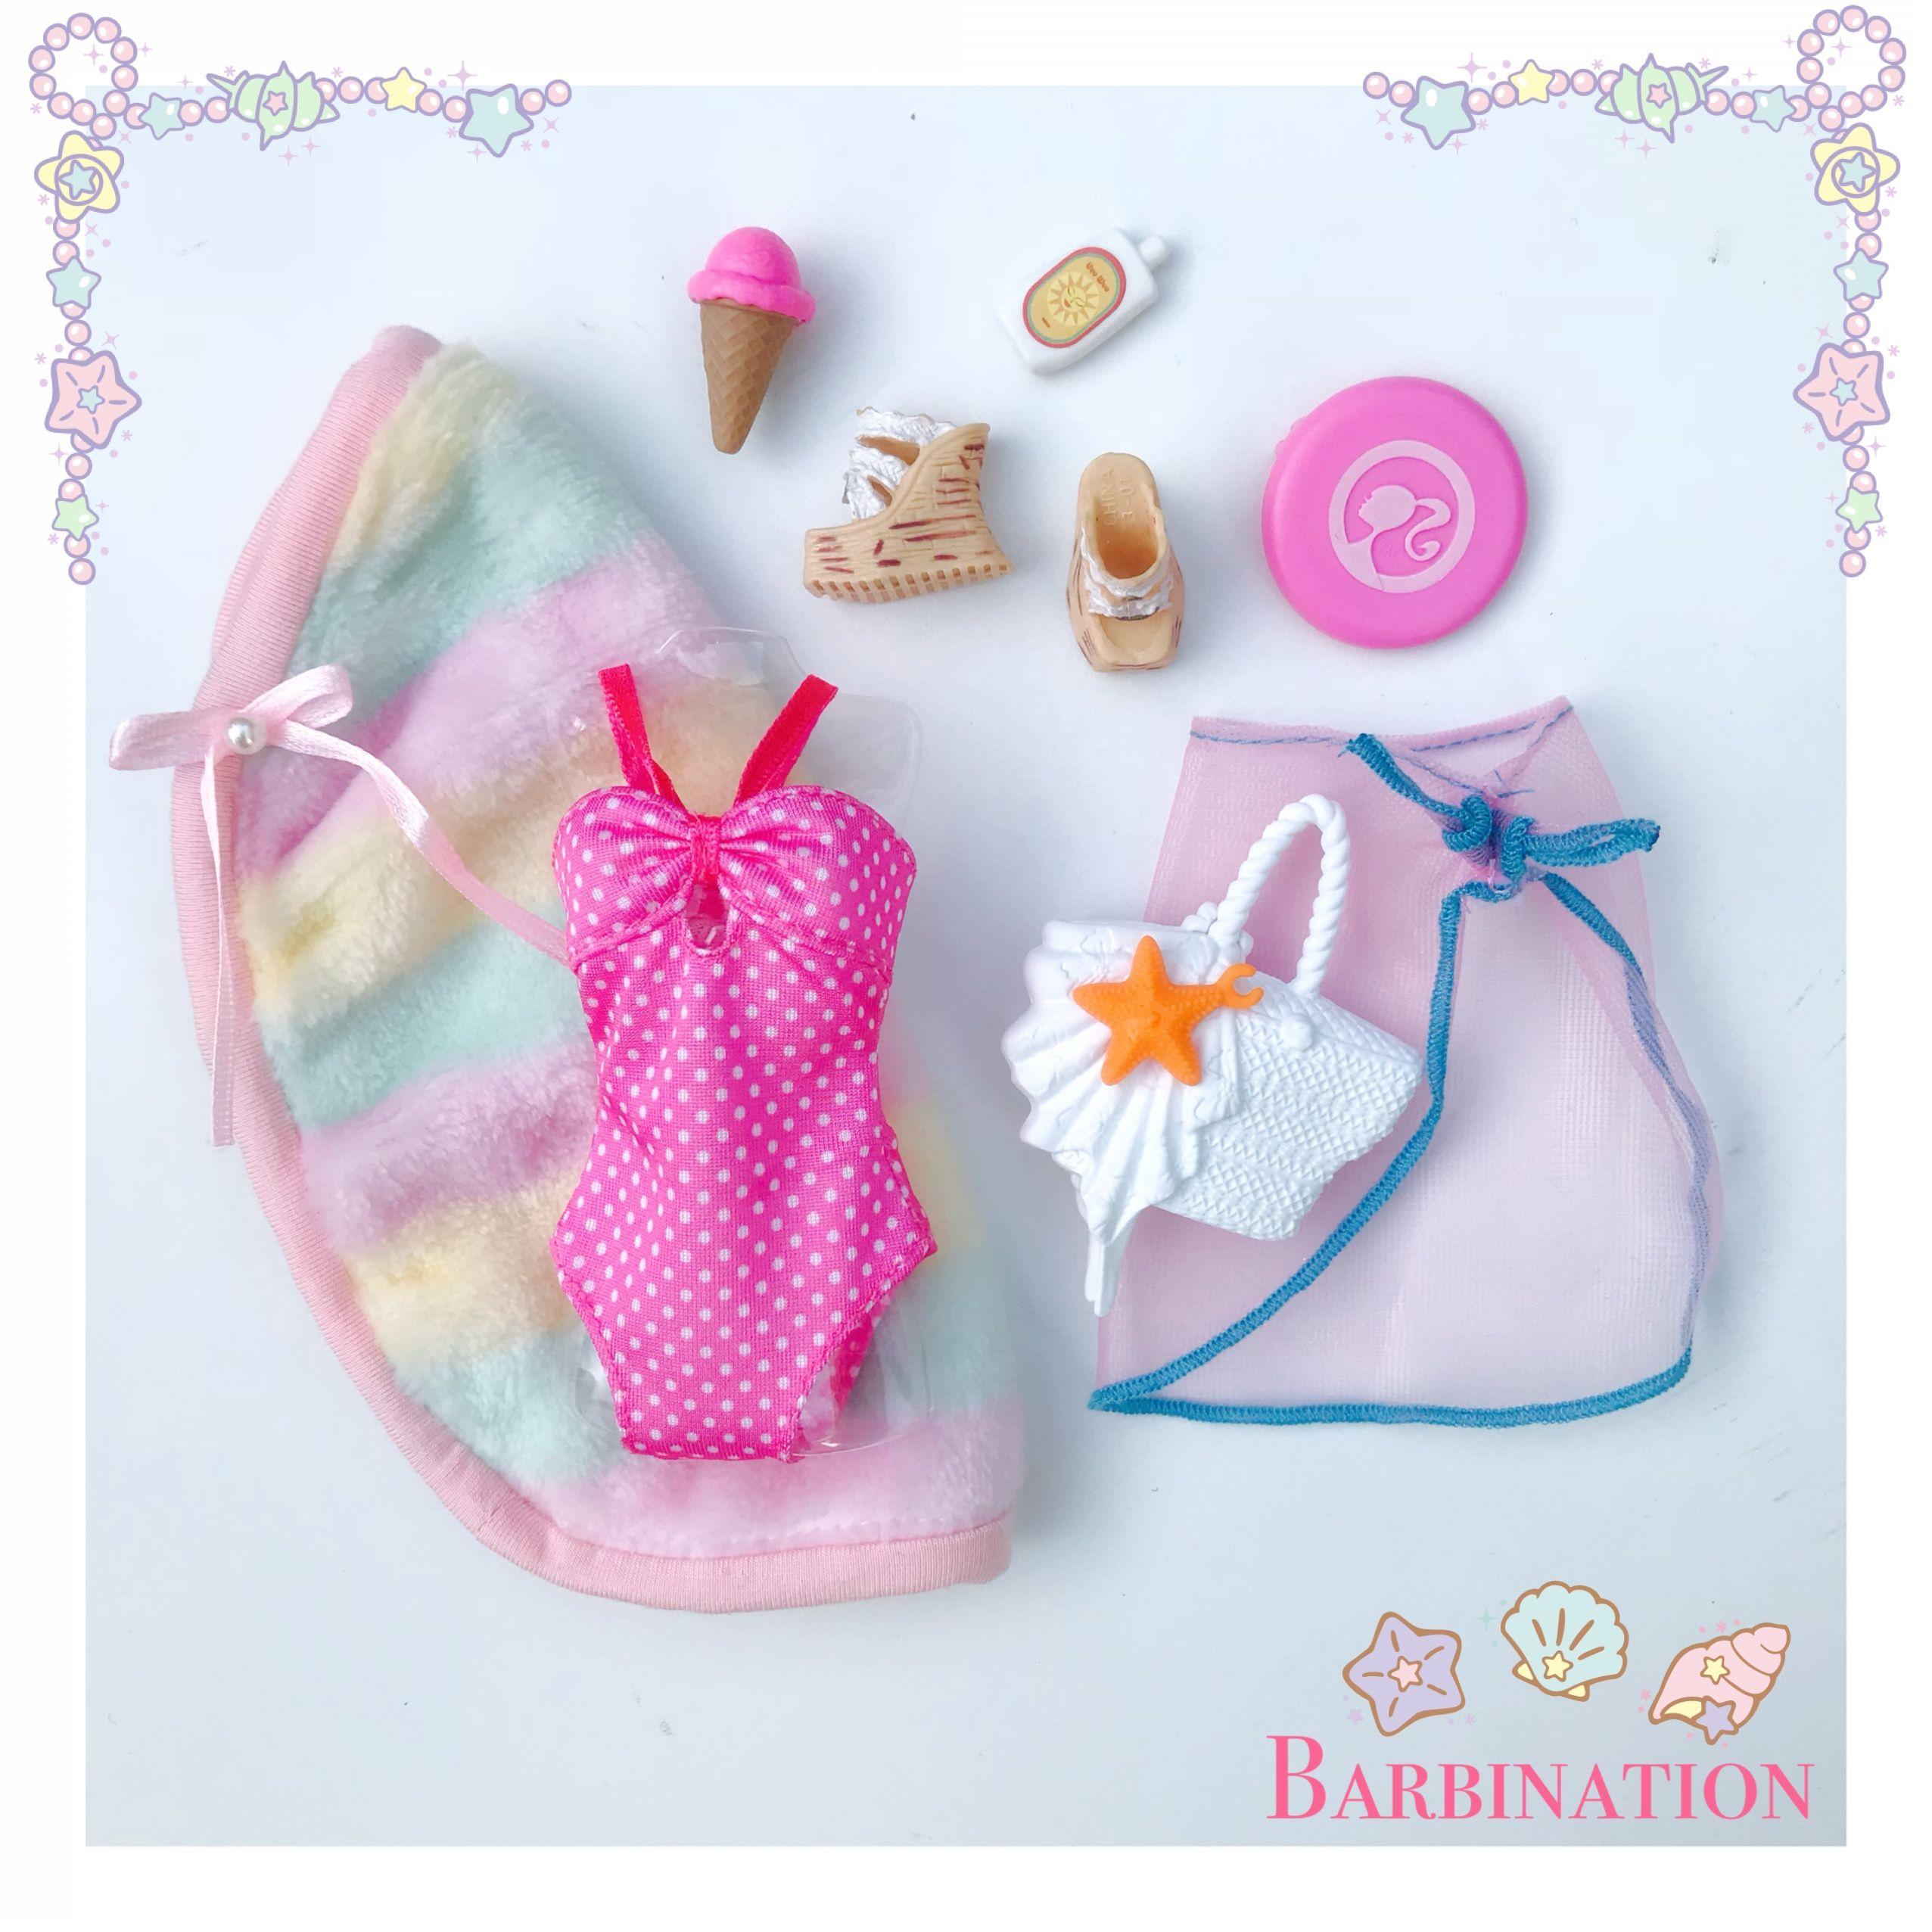 Barbielook Barbiestyle بحر مع باربي Barbie Doll Accessories Barbie Fashionista Dolls Barbie Playsets